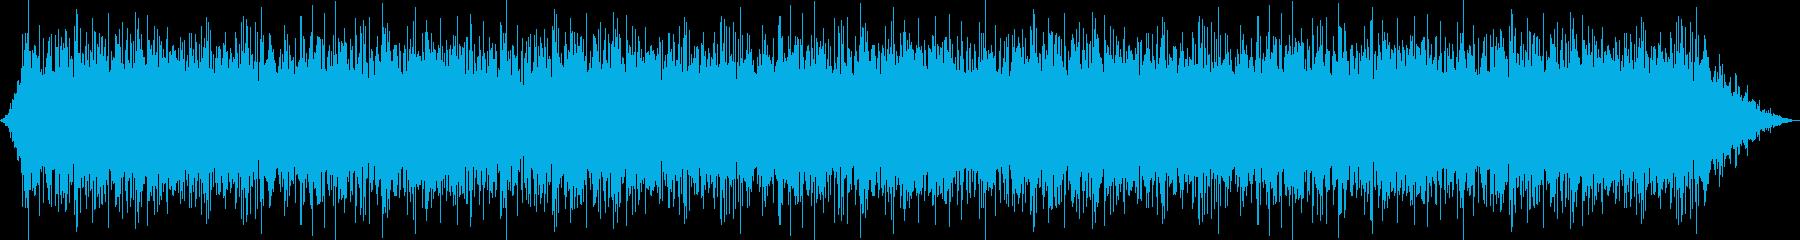 HOWL WITH WOOD FI...の再生済みの波形